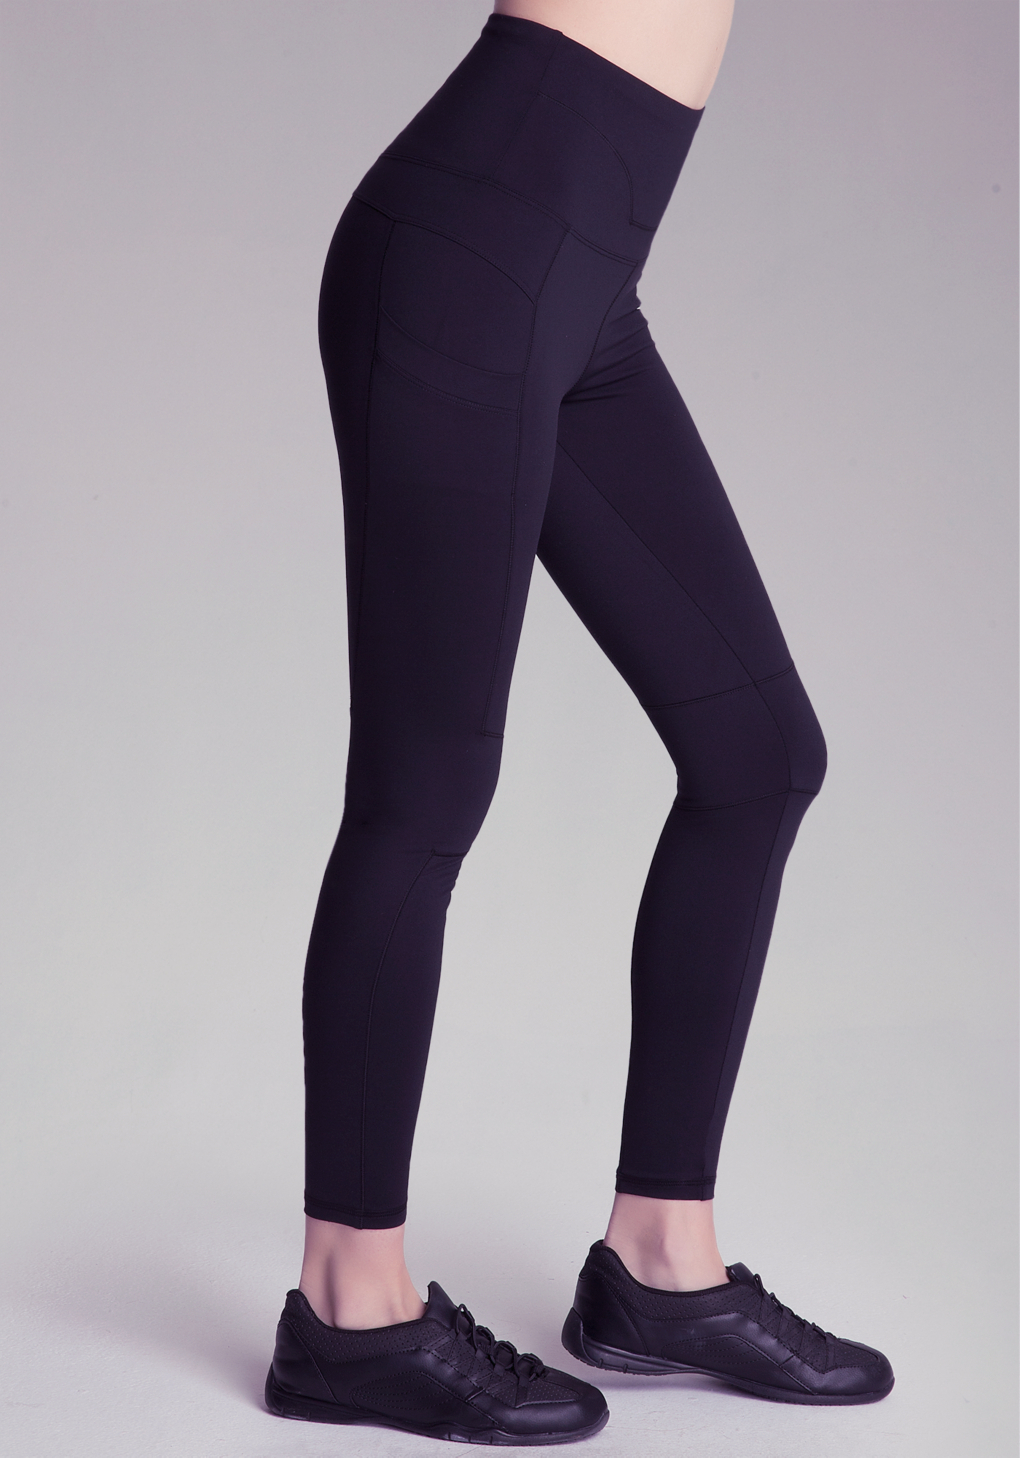 060cbacc549 Bebe High-waist Workout Leggings in Black - Lyst